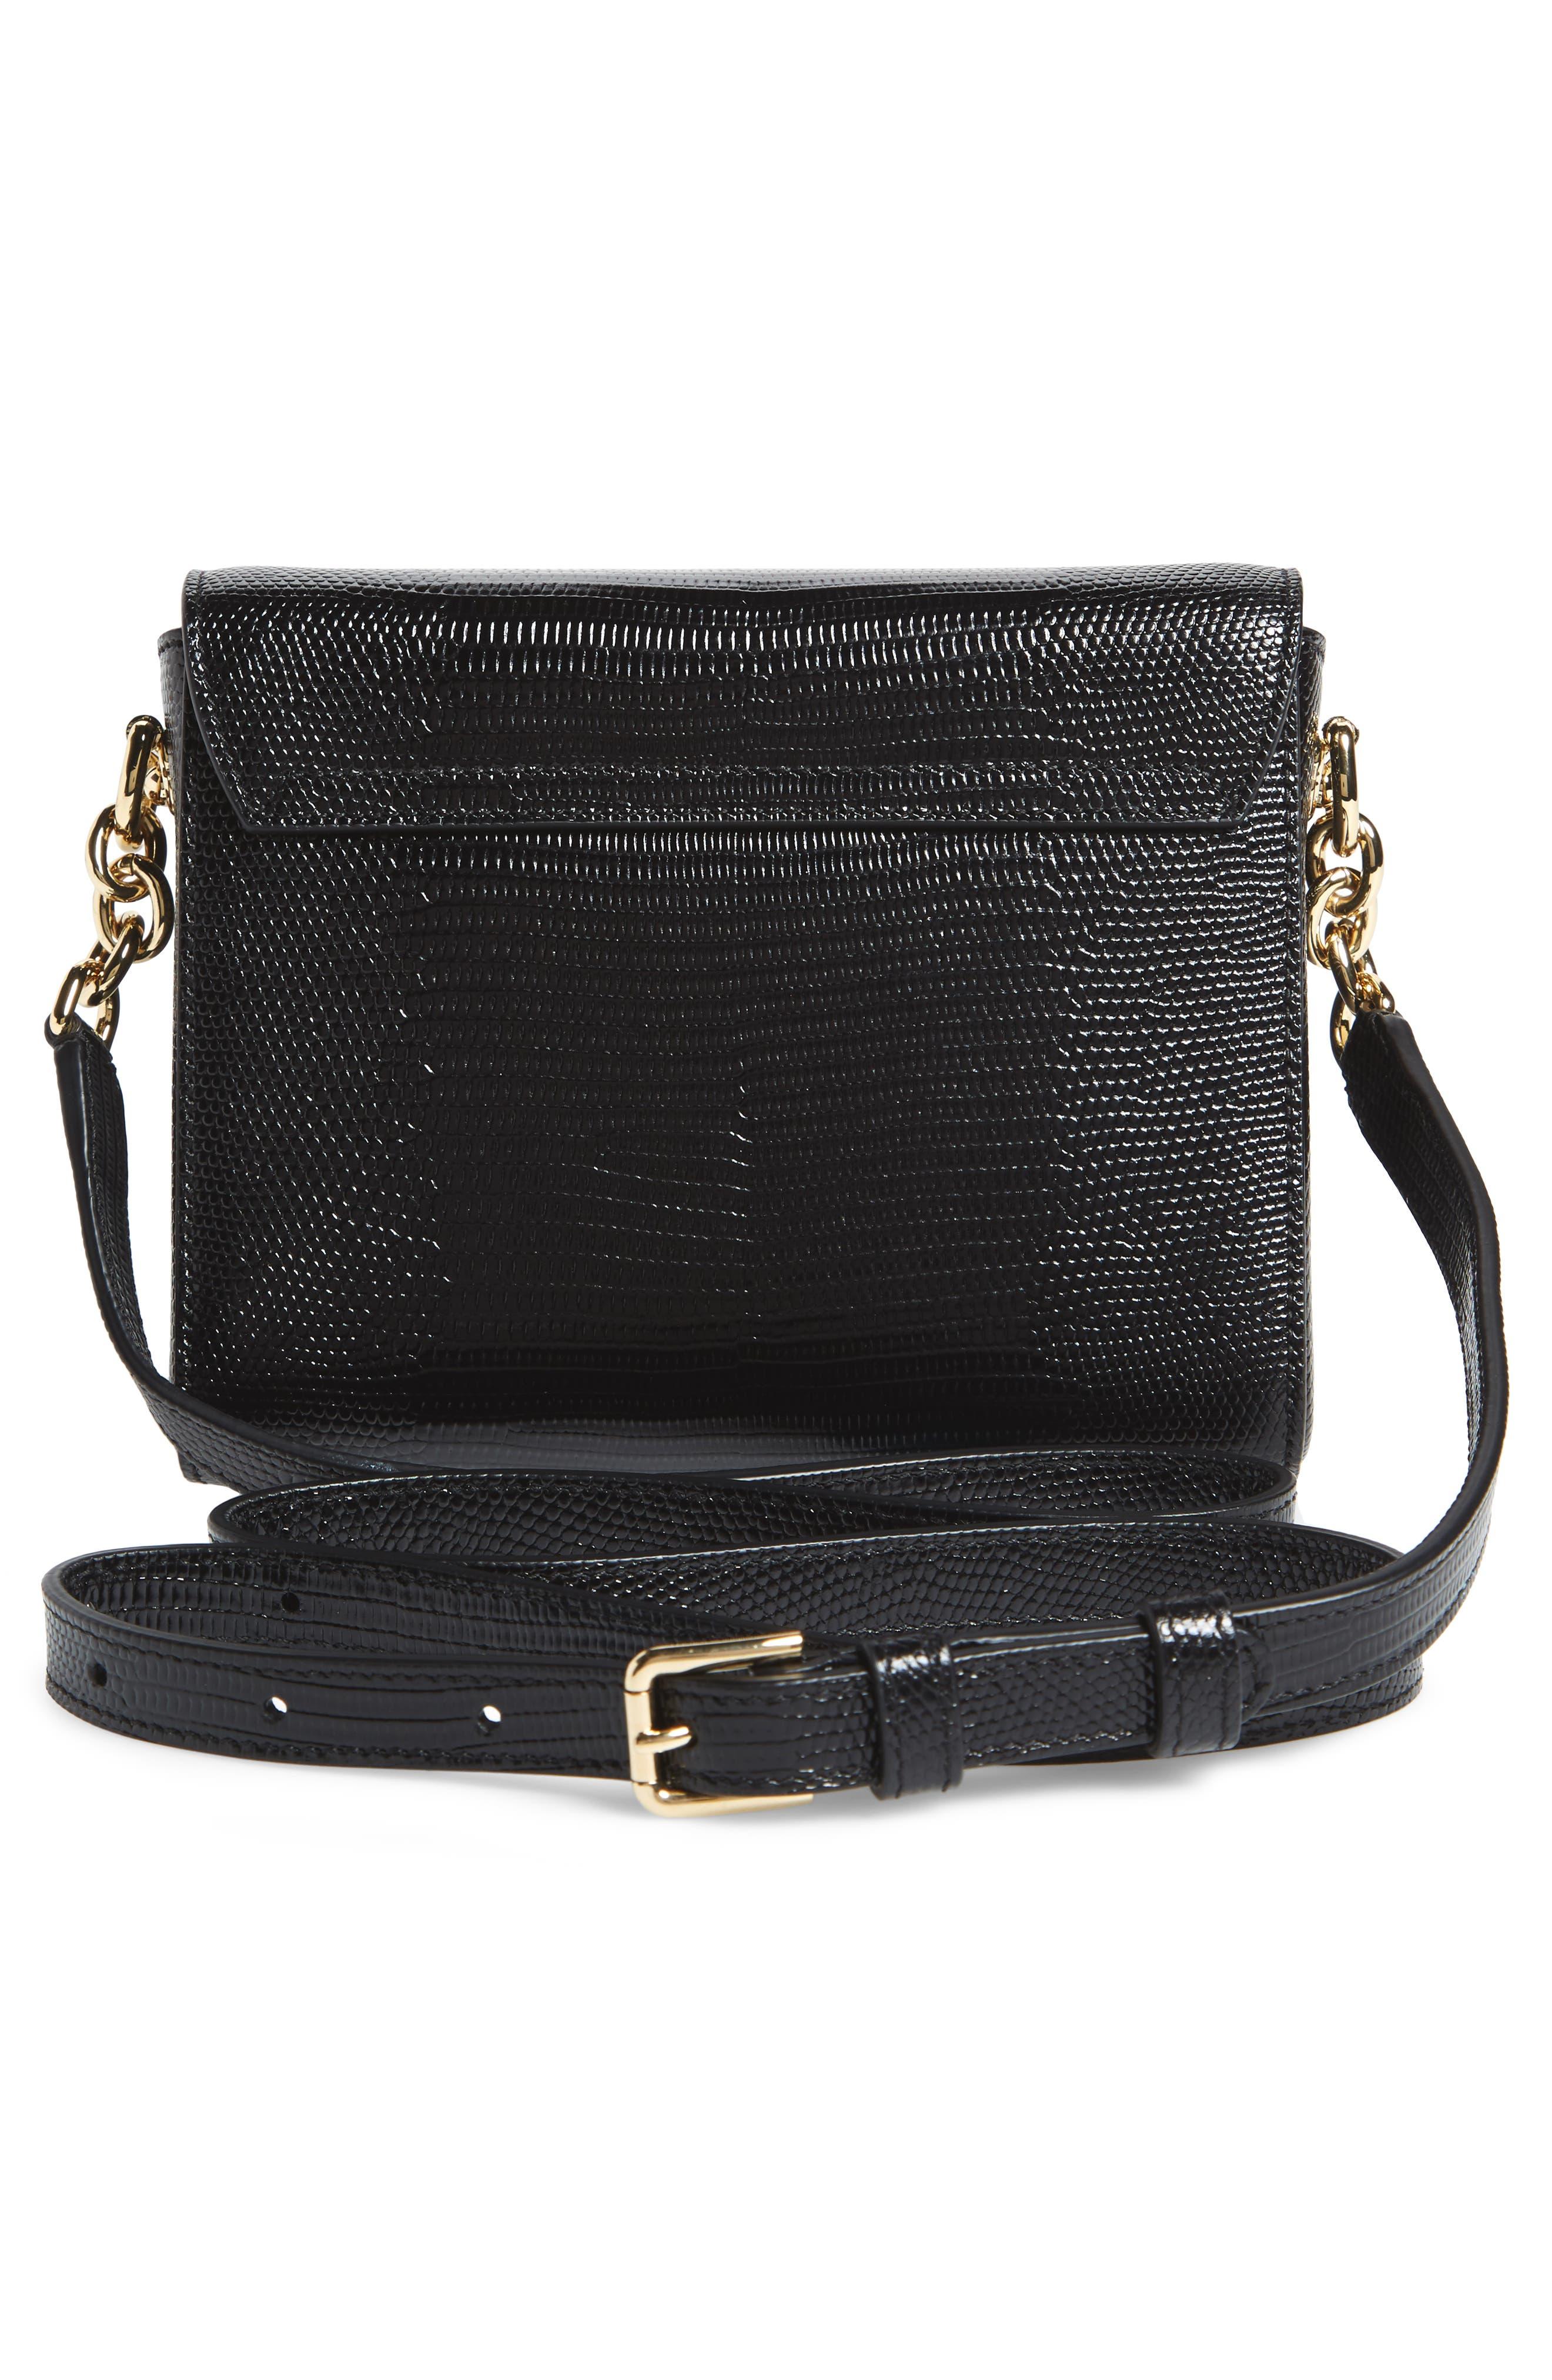 Alternate Image 3  - Dolce&Gabbana Millennial Reptile Embossed Leather Crossbody Bag